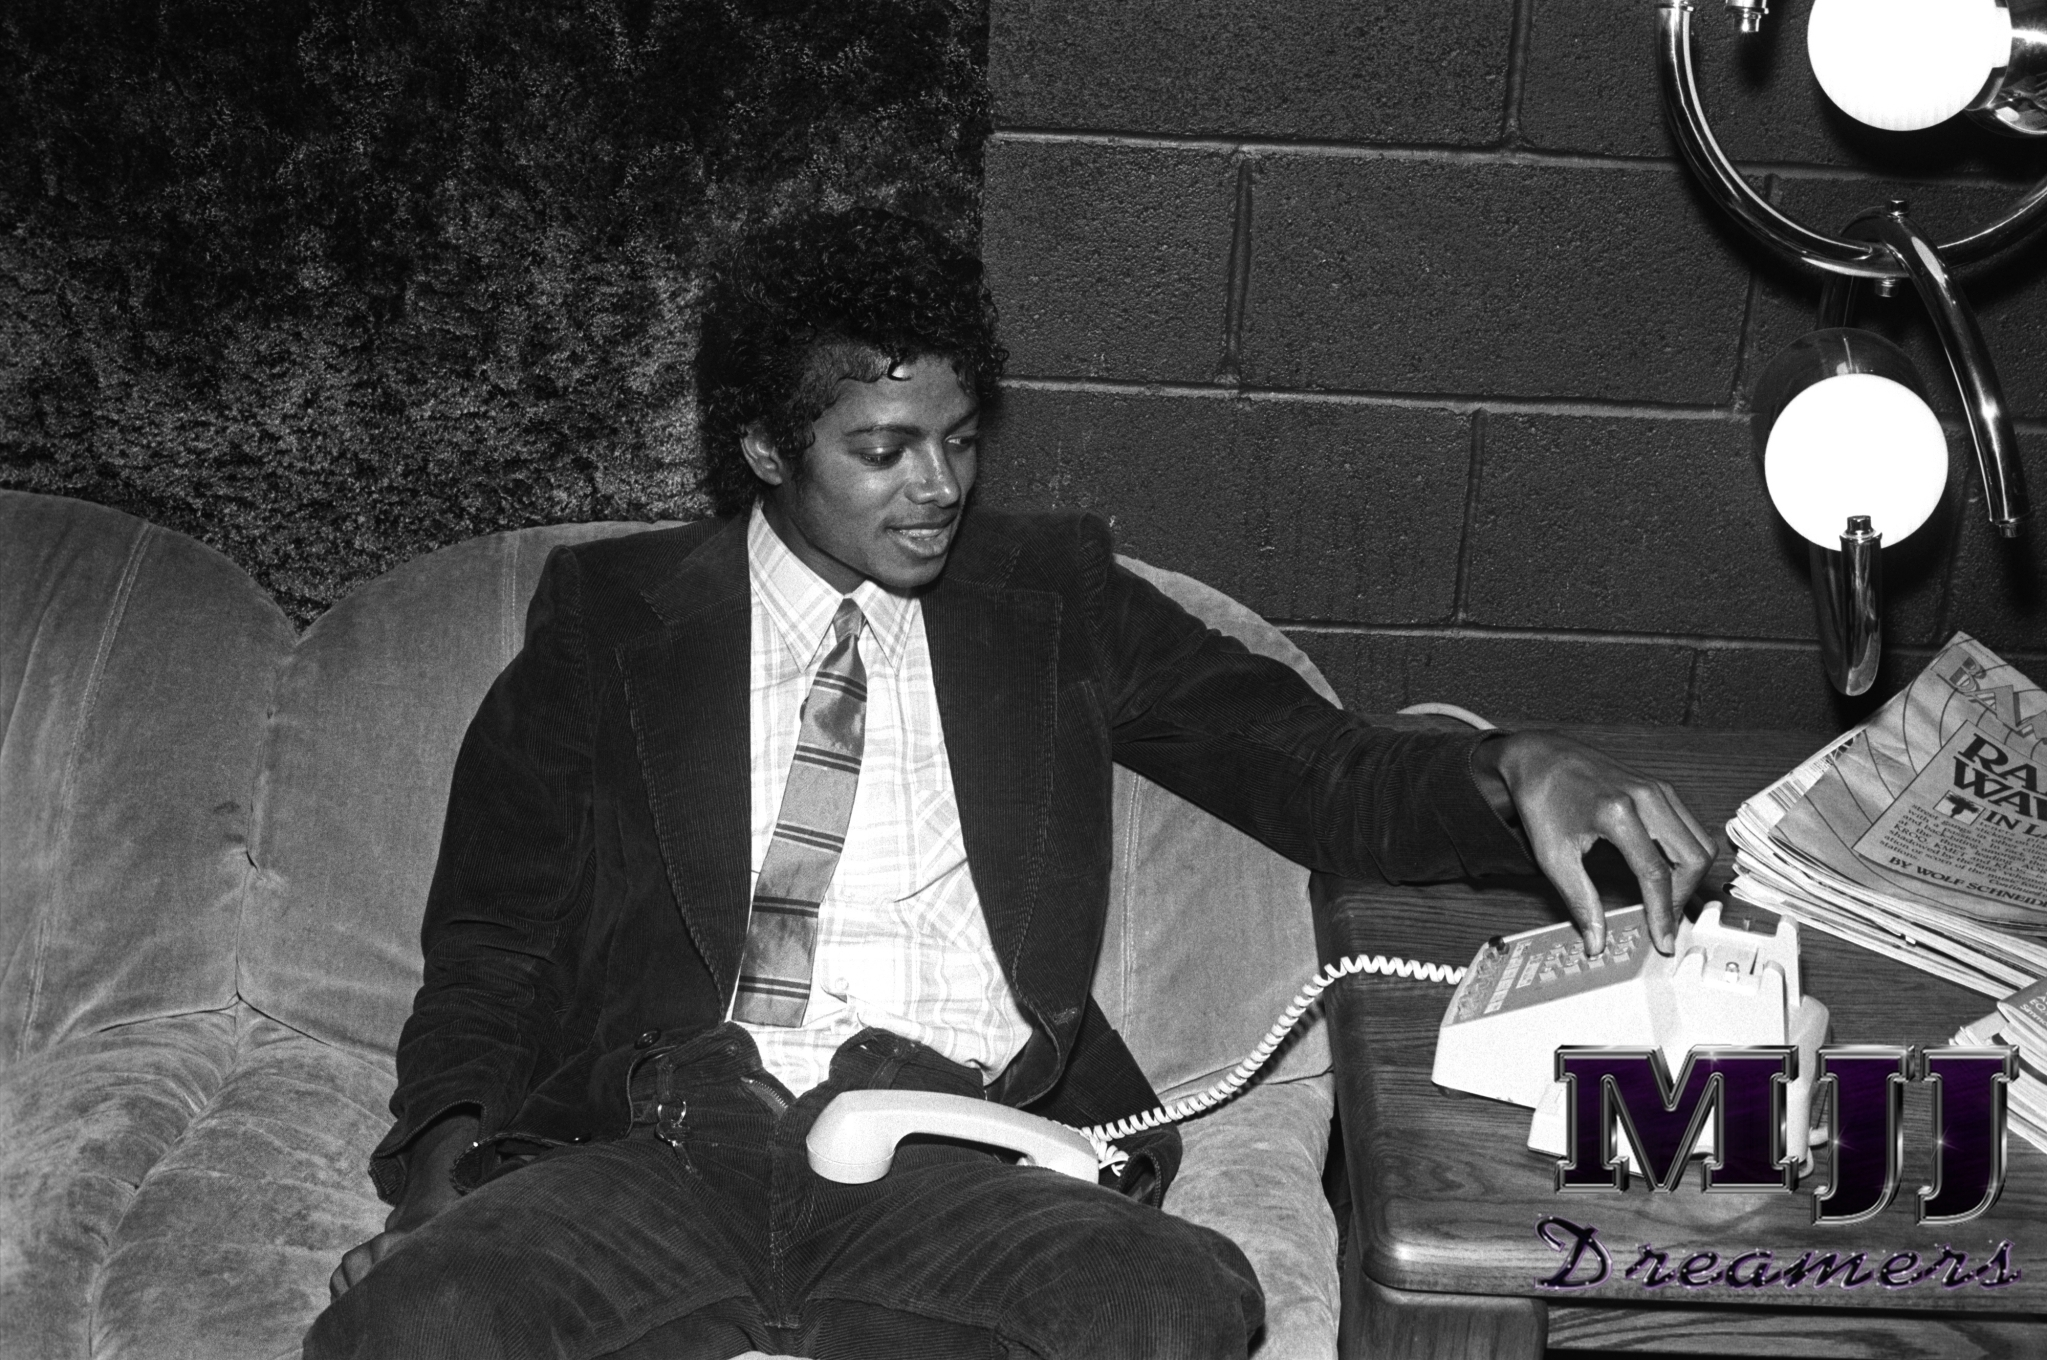 FOTO IN HD SEXY-SEXY-SEXY-MJ-michael-jackson-17820279-2047-1360